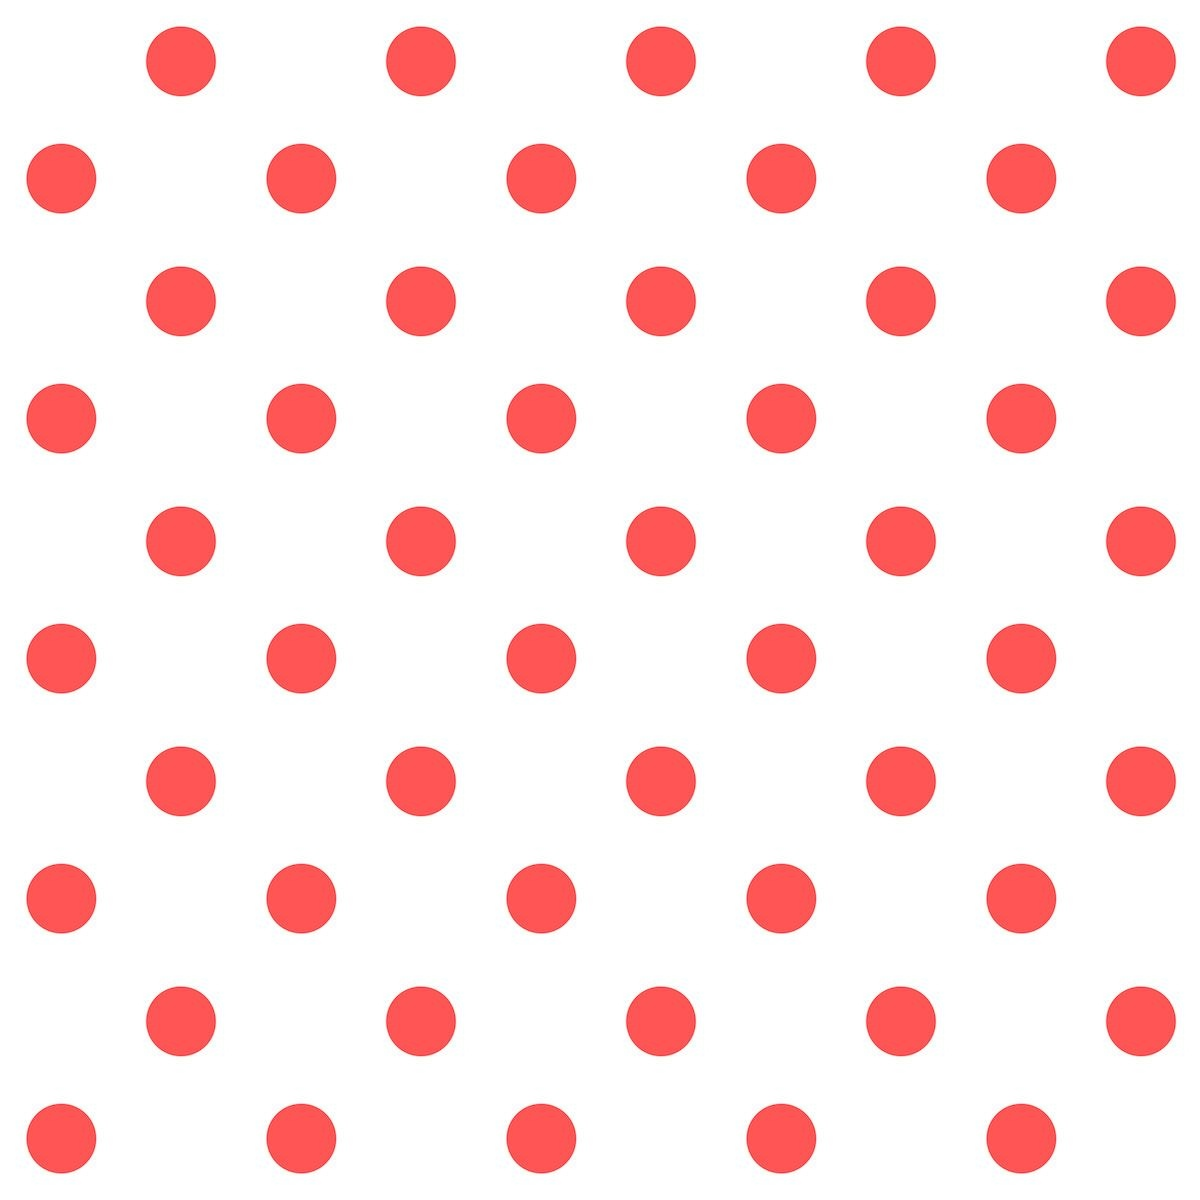 Free Digital Polka Dot Scrapbooking Paper: Red-And-White - Free Printable Pink Polka Dot Paper